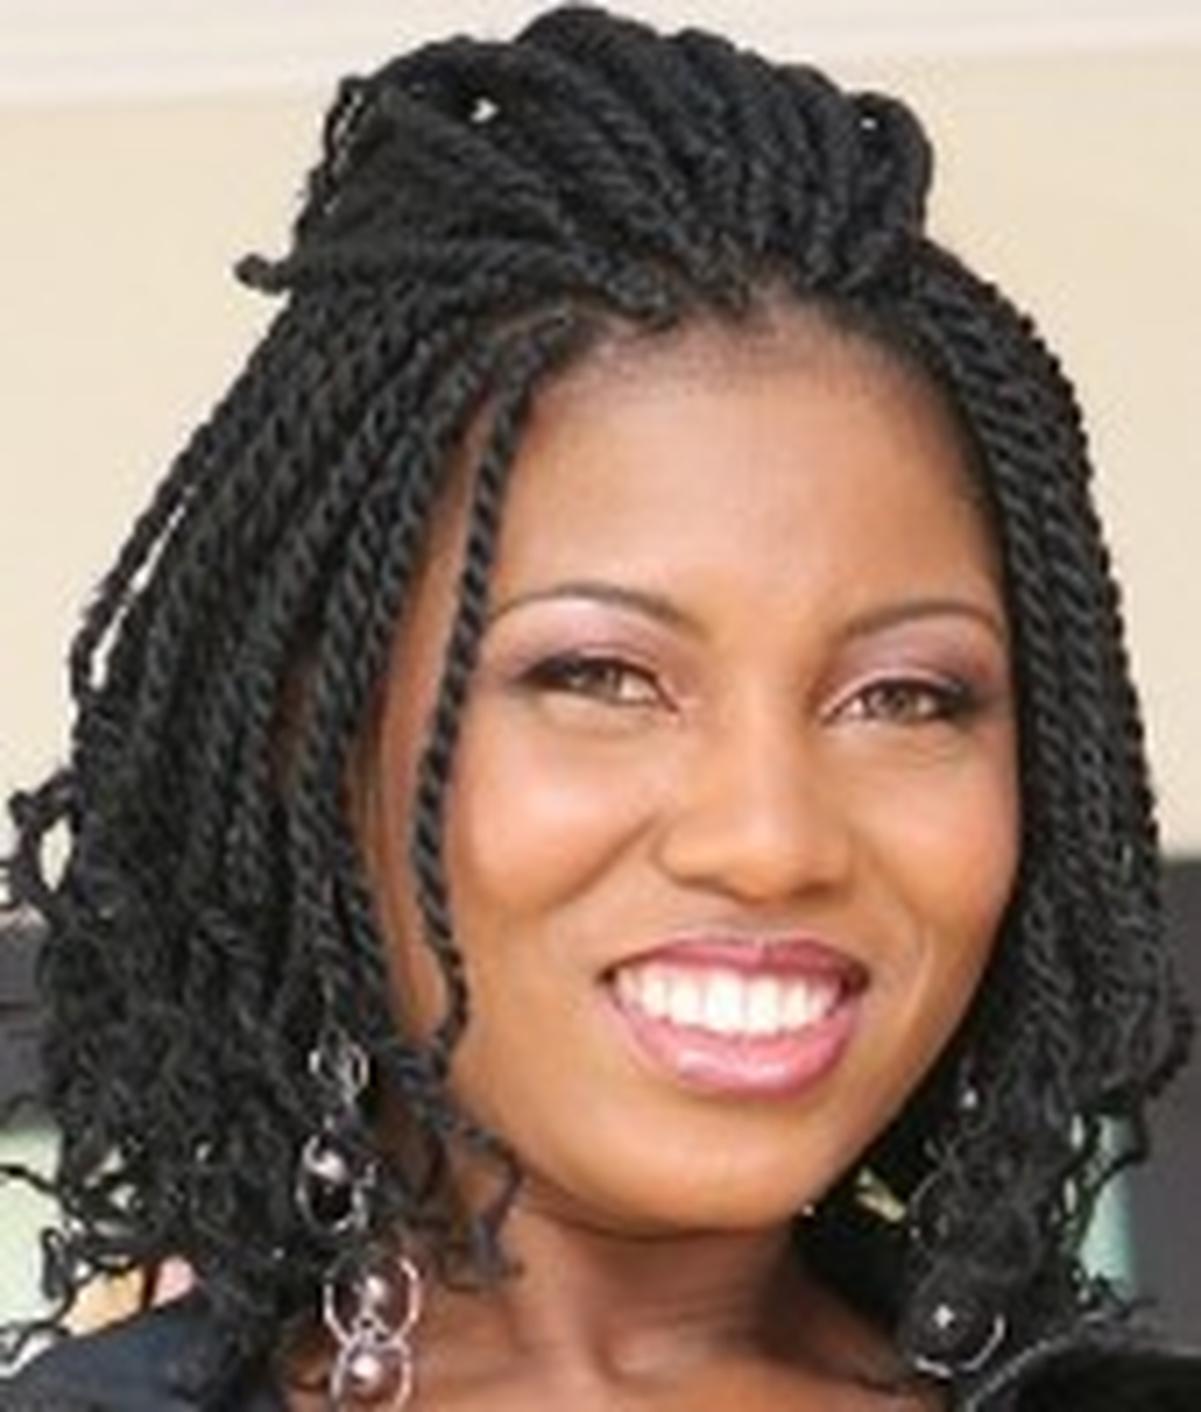 Ms. Simone